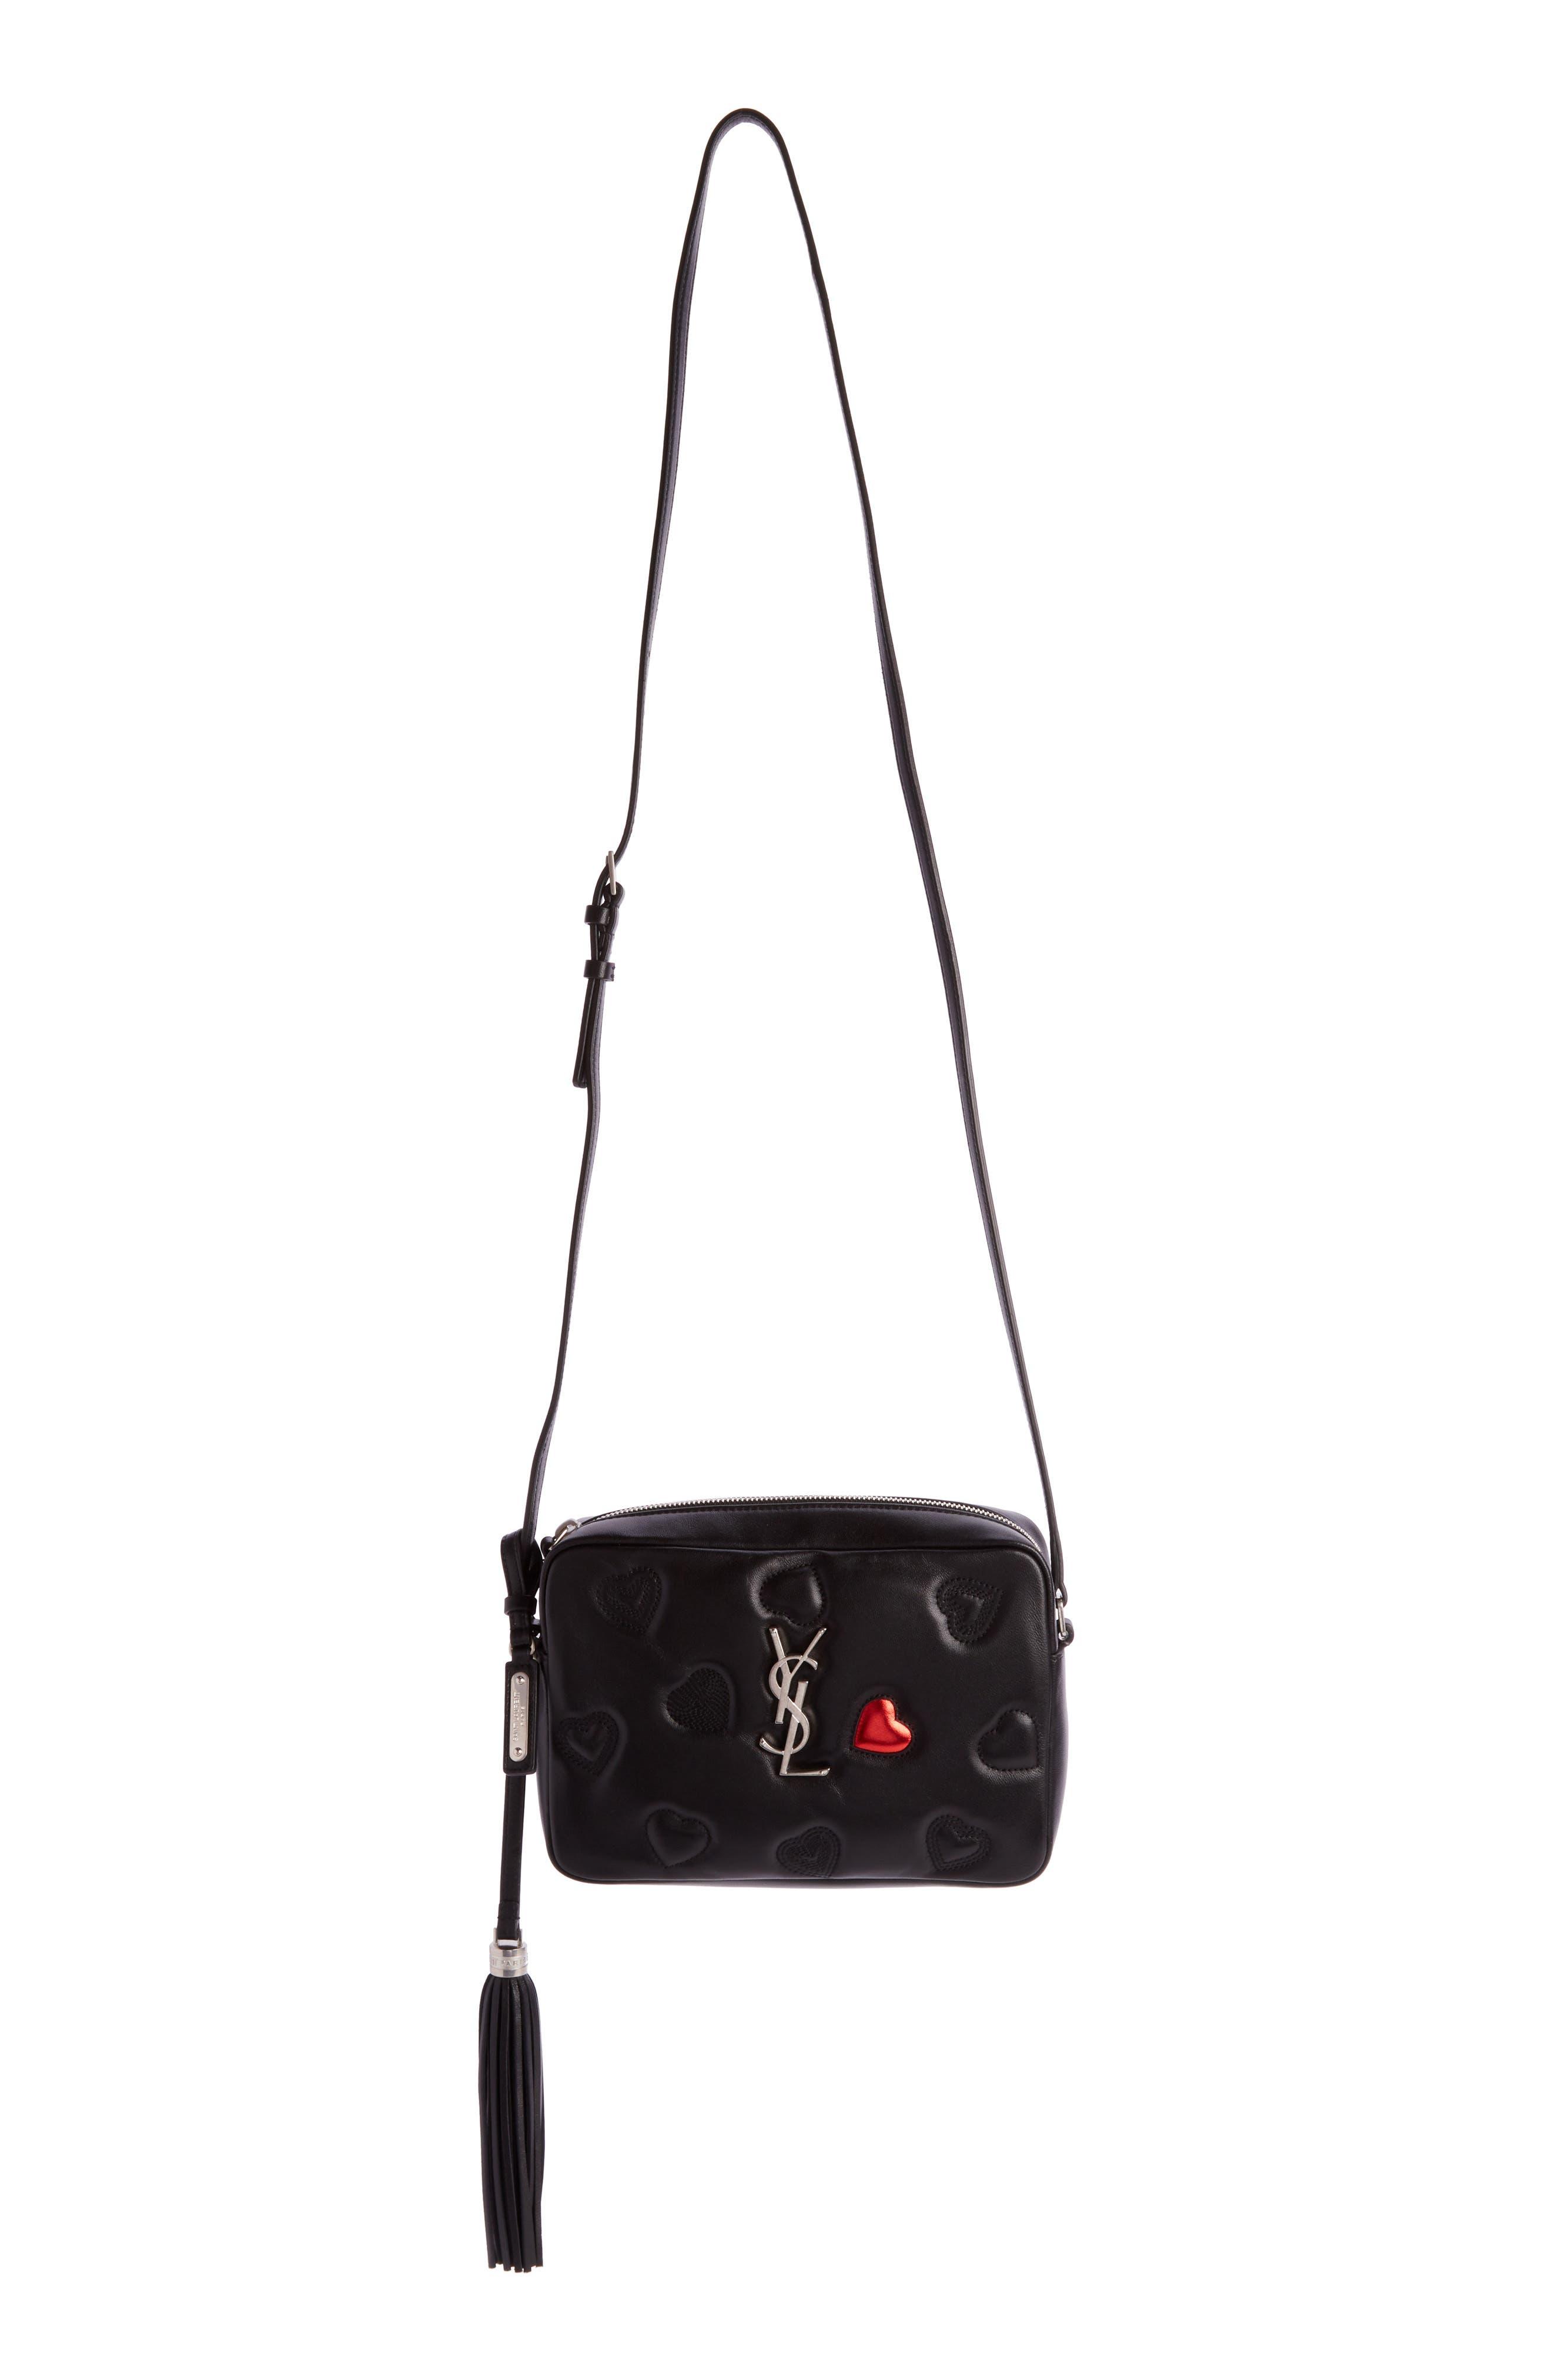 Saint Laurent Medium Lou Lambskin Leather Camera Bag